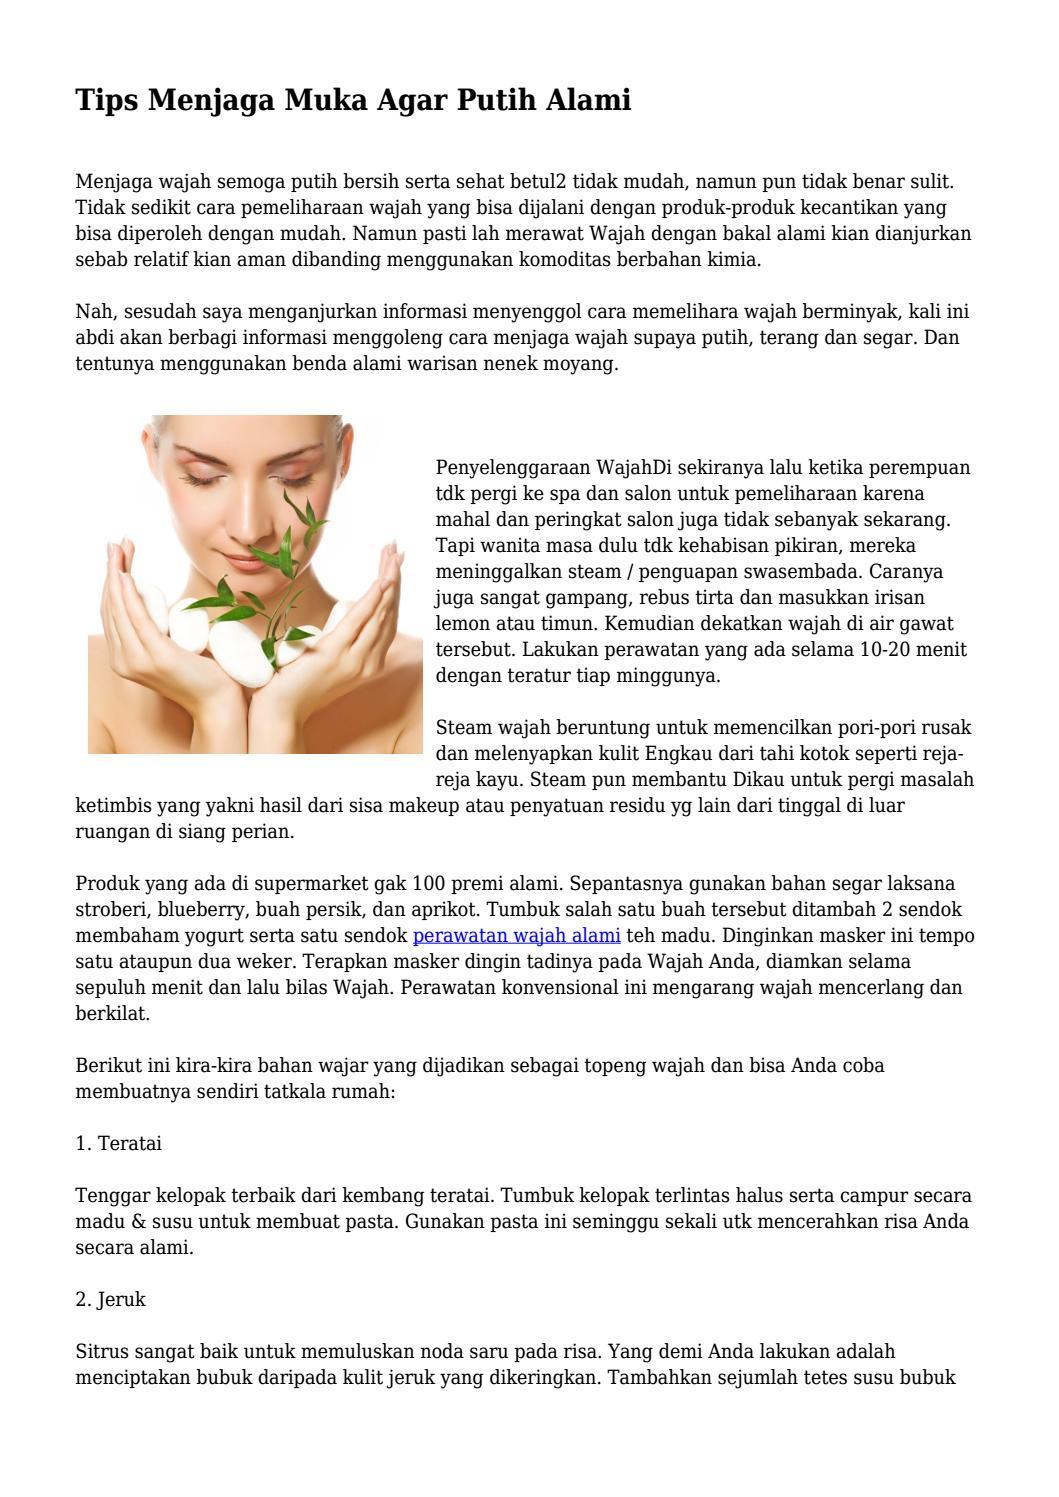 Tips Menjaga Muka Agar Putih Alami By Edukesehatancorp Issuu